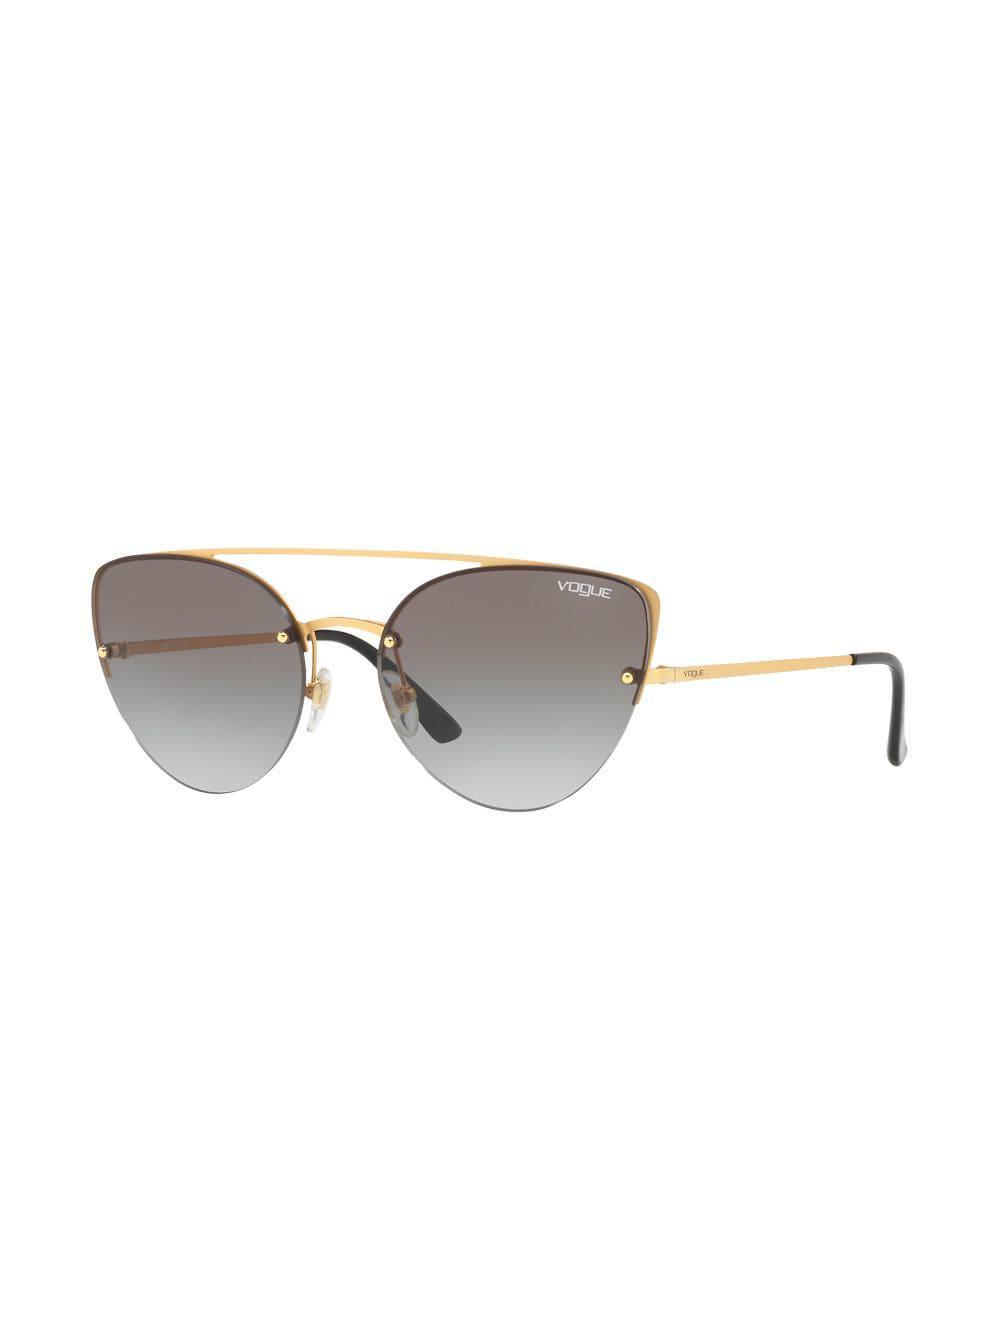 Eyewear Eye Metallic Vogue Lyst In Sunglasses Oversized Cat 4wqZzq6